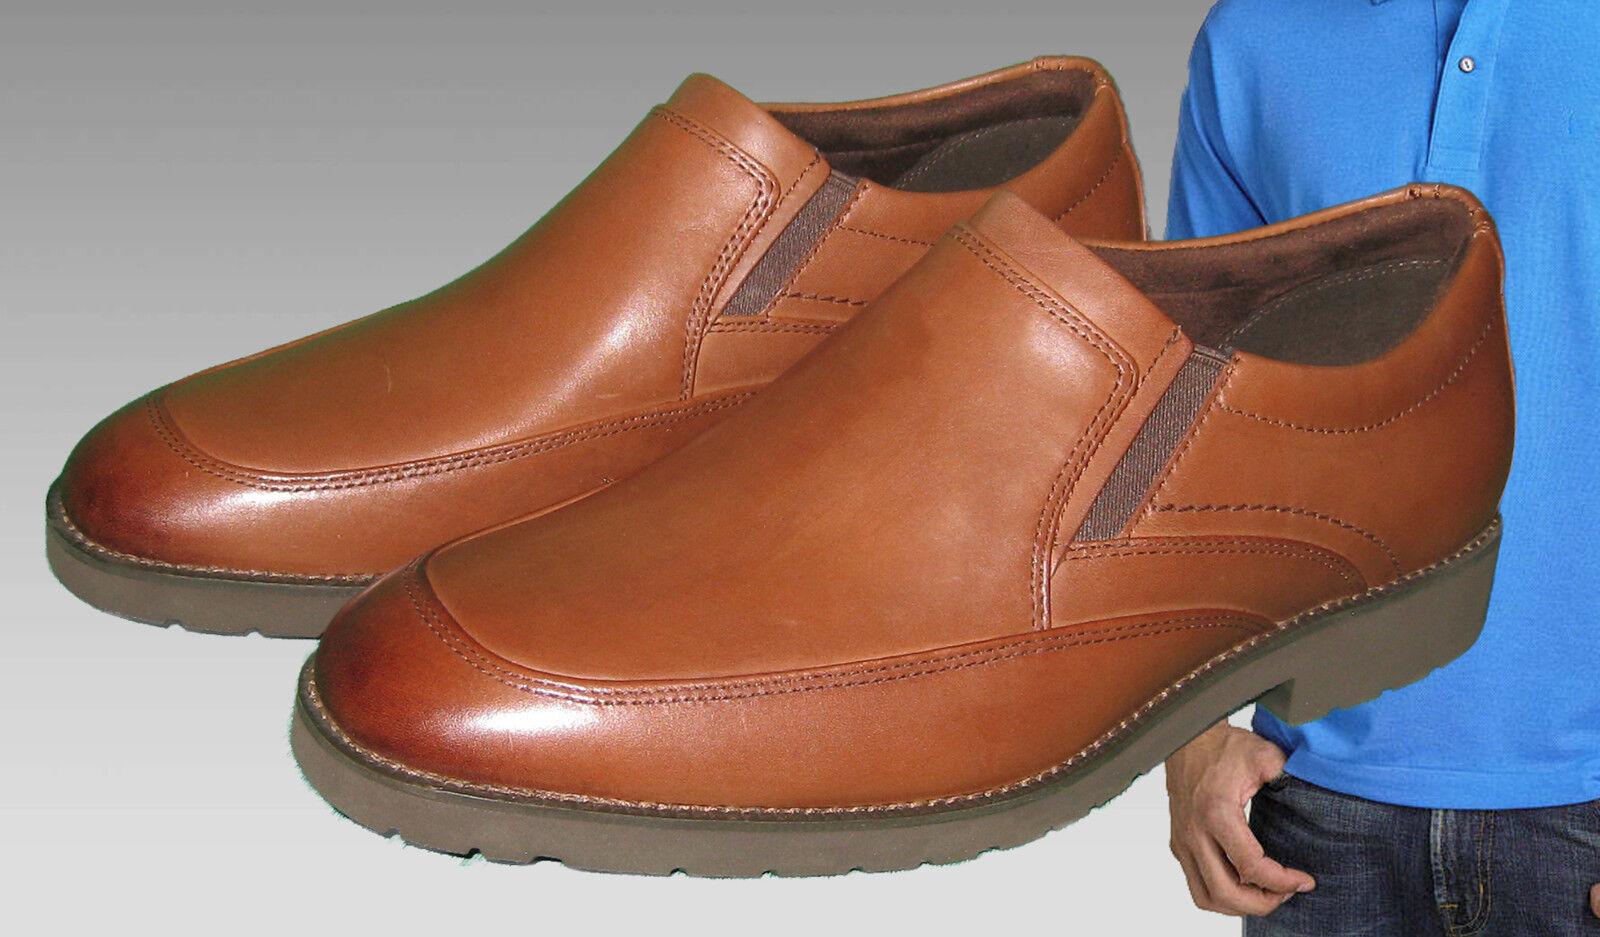 Rockport Hombre OC Roble Circular Sin Cordones Mocasín Con ADIDAS ADIPRENE  Scarpe classiche da uomo